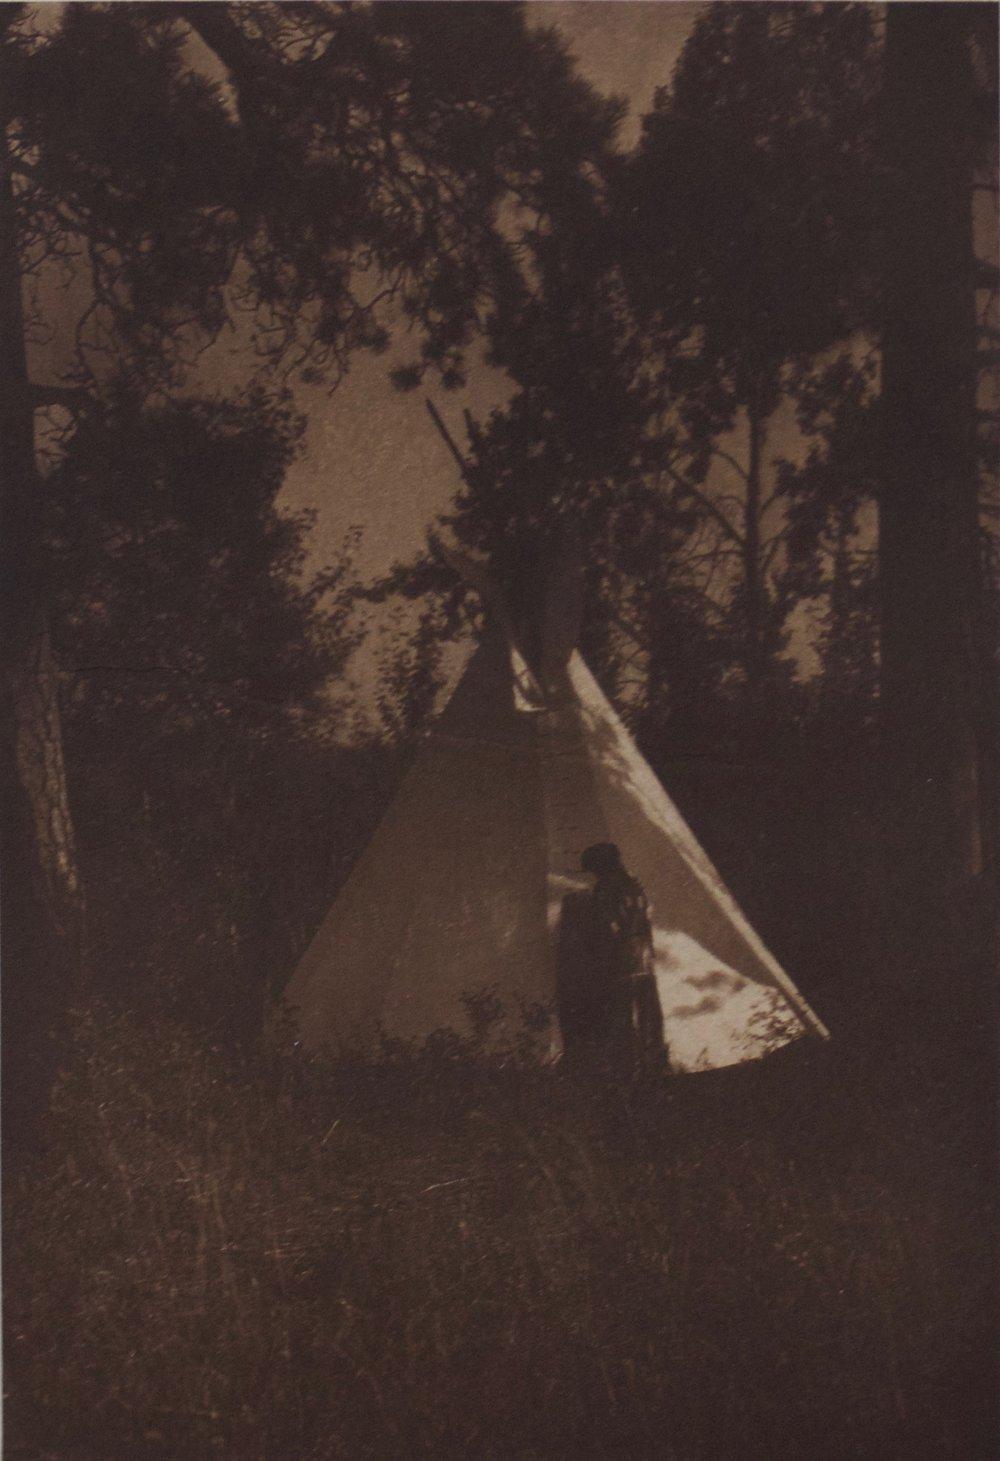 "Edward S. Curtis    Camp in the Forest , Kutenai, 1910  Photogravure, Vellum  Framed 23.5"" x 19.5""  BV0149"